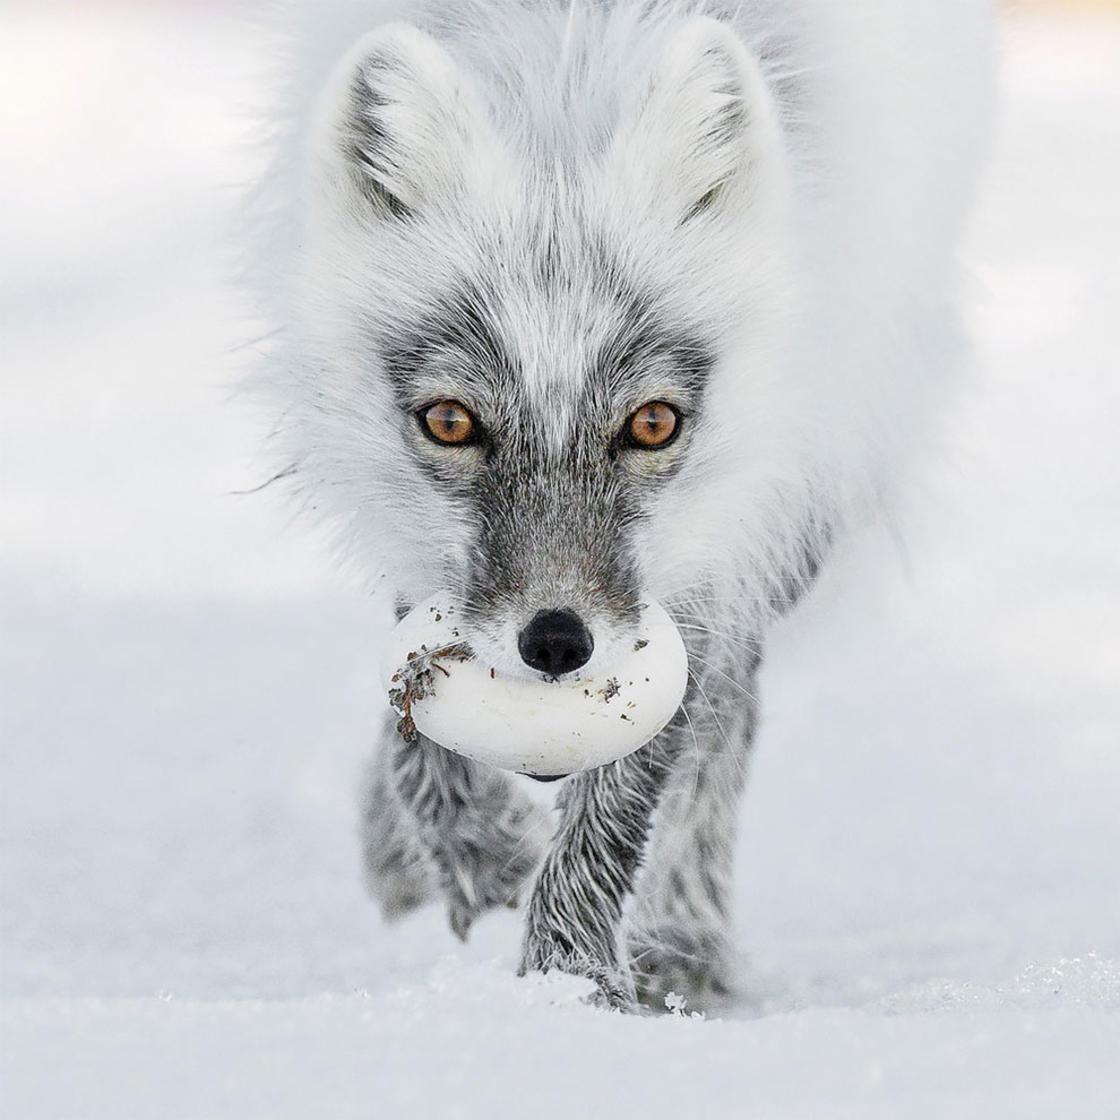 © Sergey Gorshkov / Wildlife Photographer of the Year